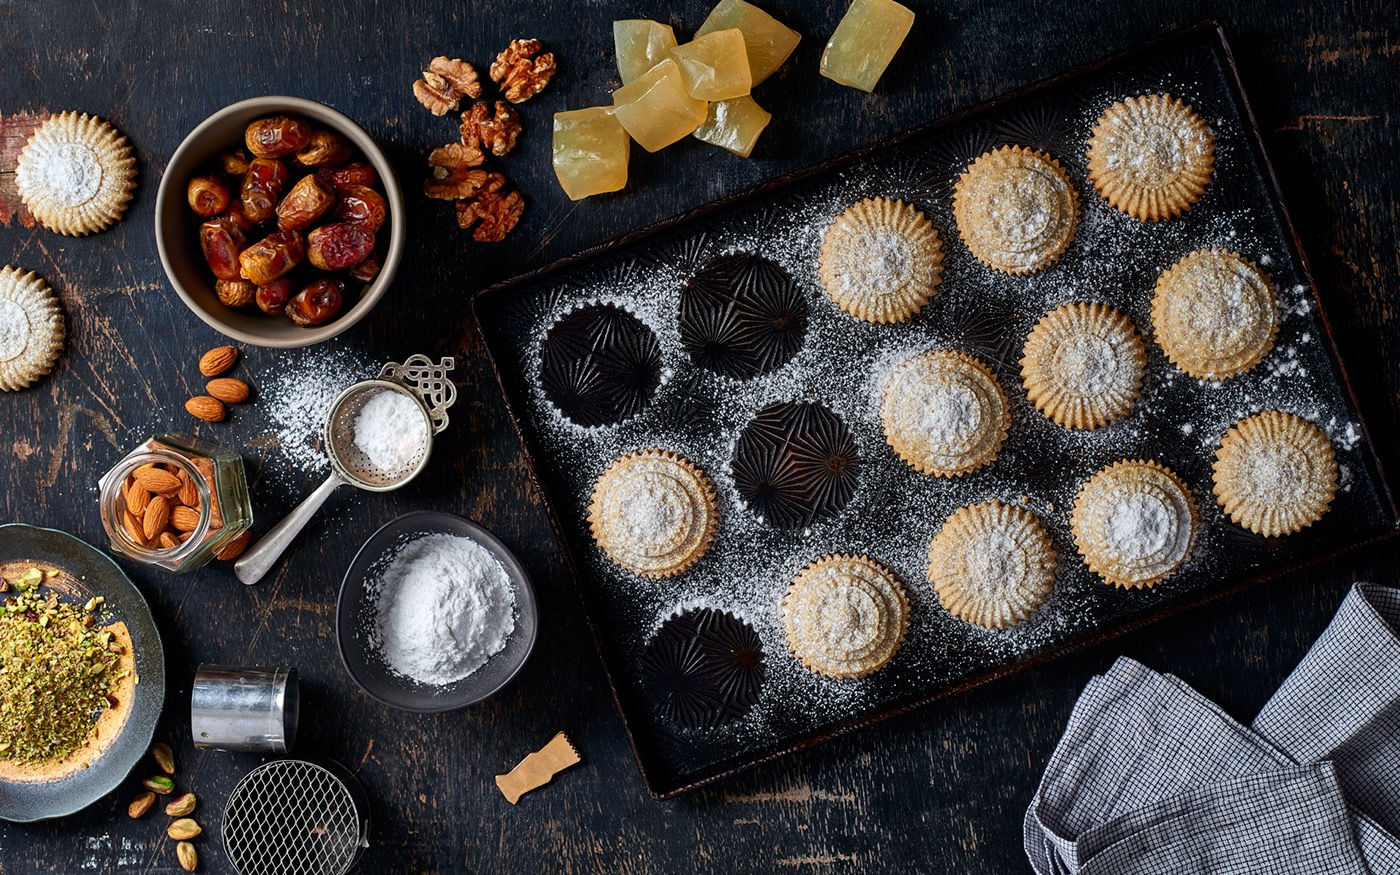 Свежий хлеб The Artisanal Bakery /Sarah Ibrahim